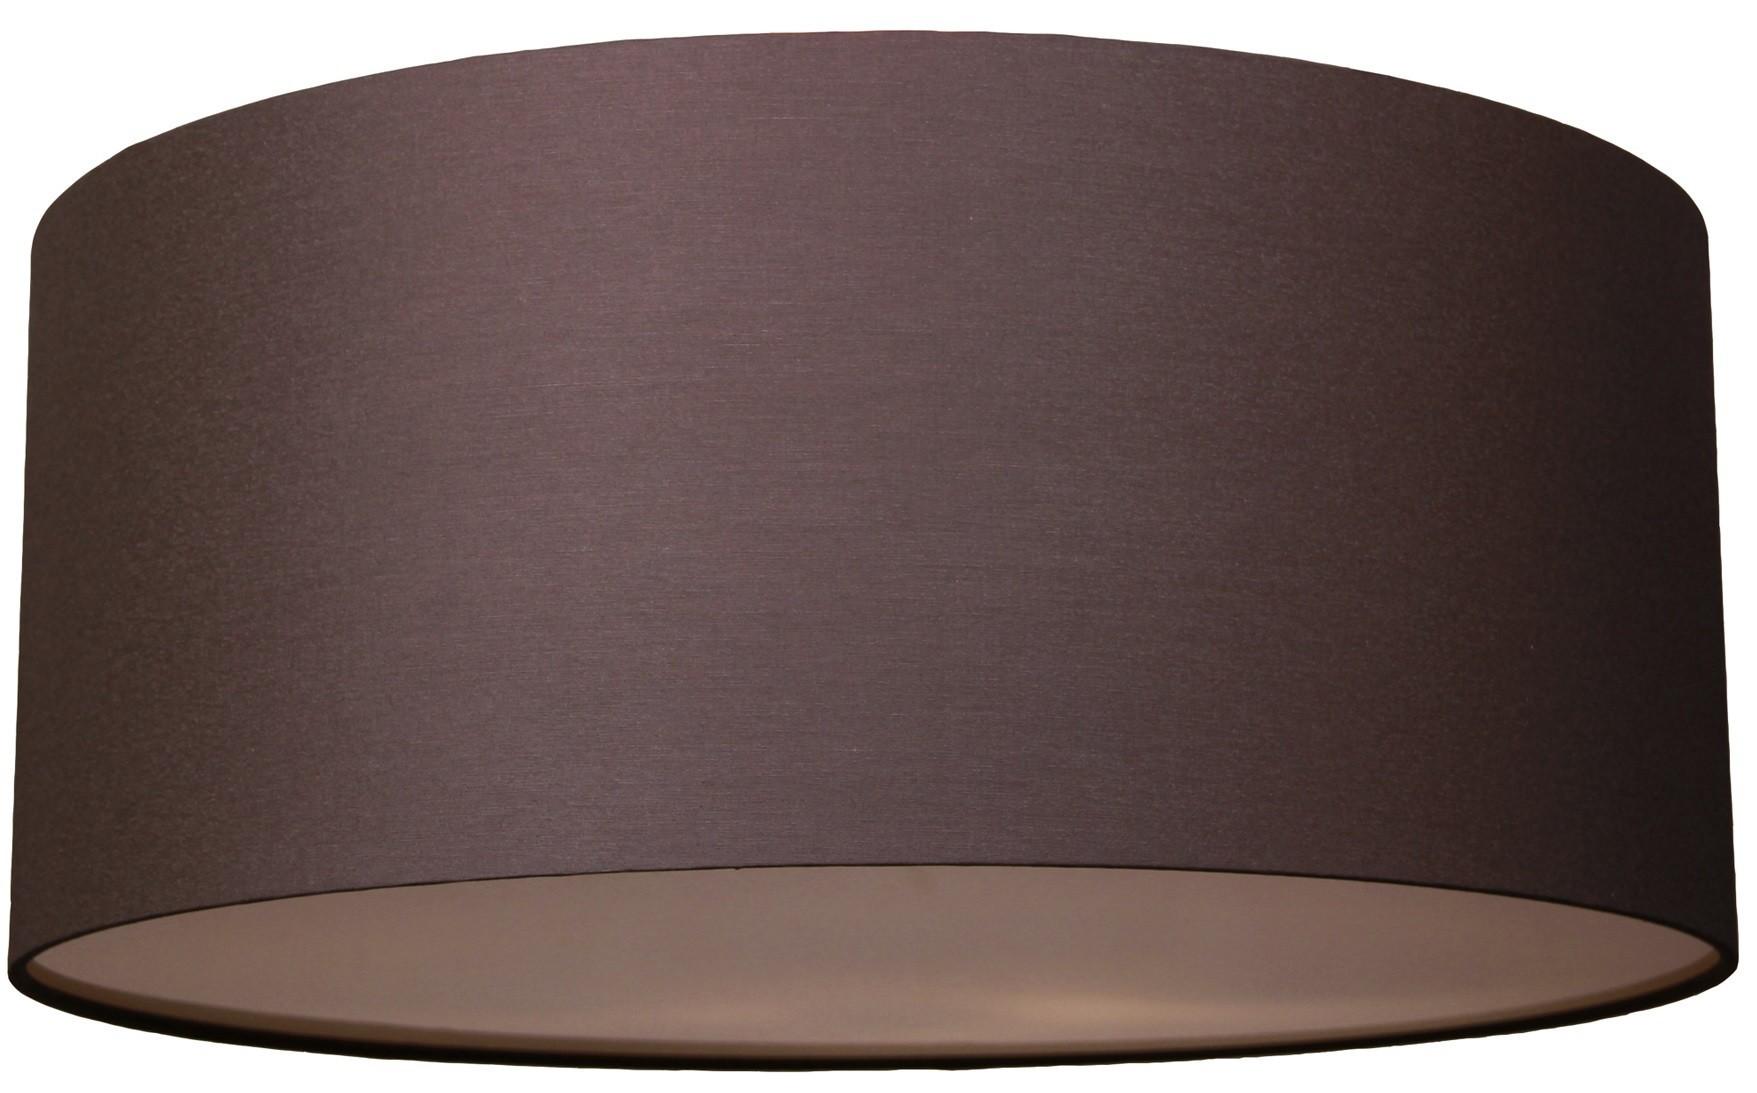 waldi leuchten stockholm deckenleuchte 3 flammig eek. Black Bedroom Furniture Sets. Home Design Ideas